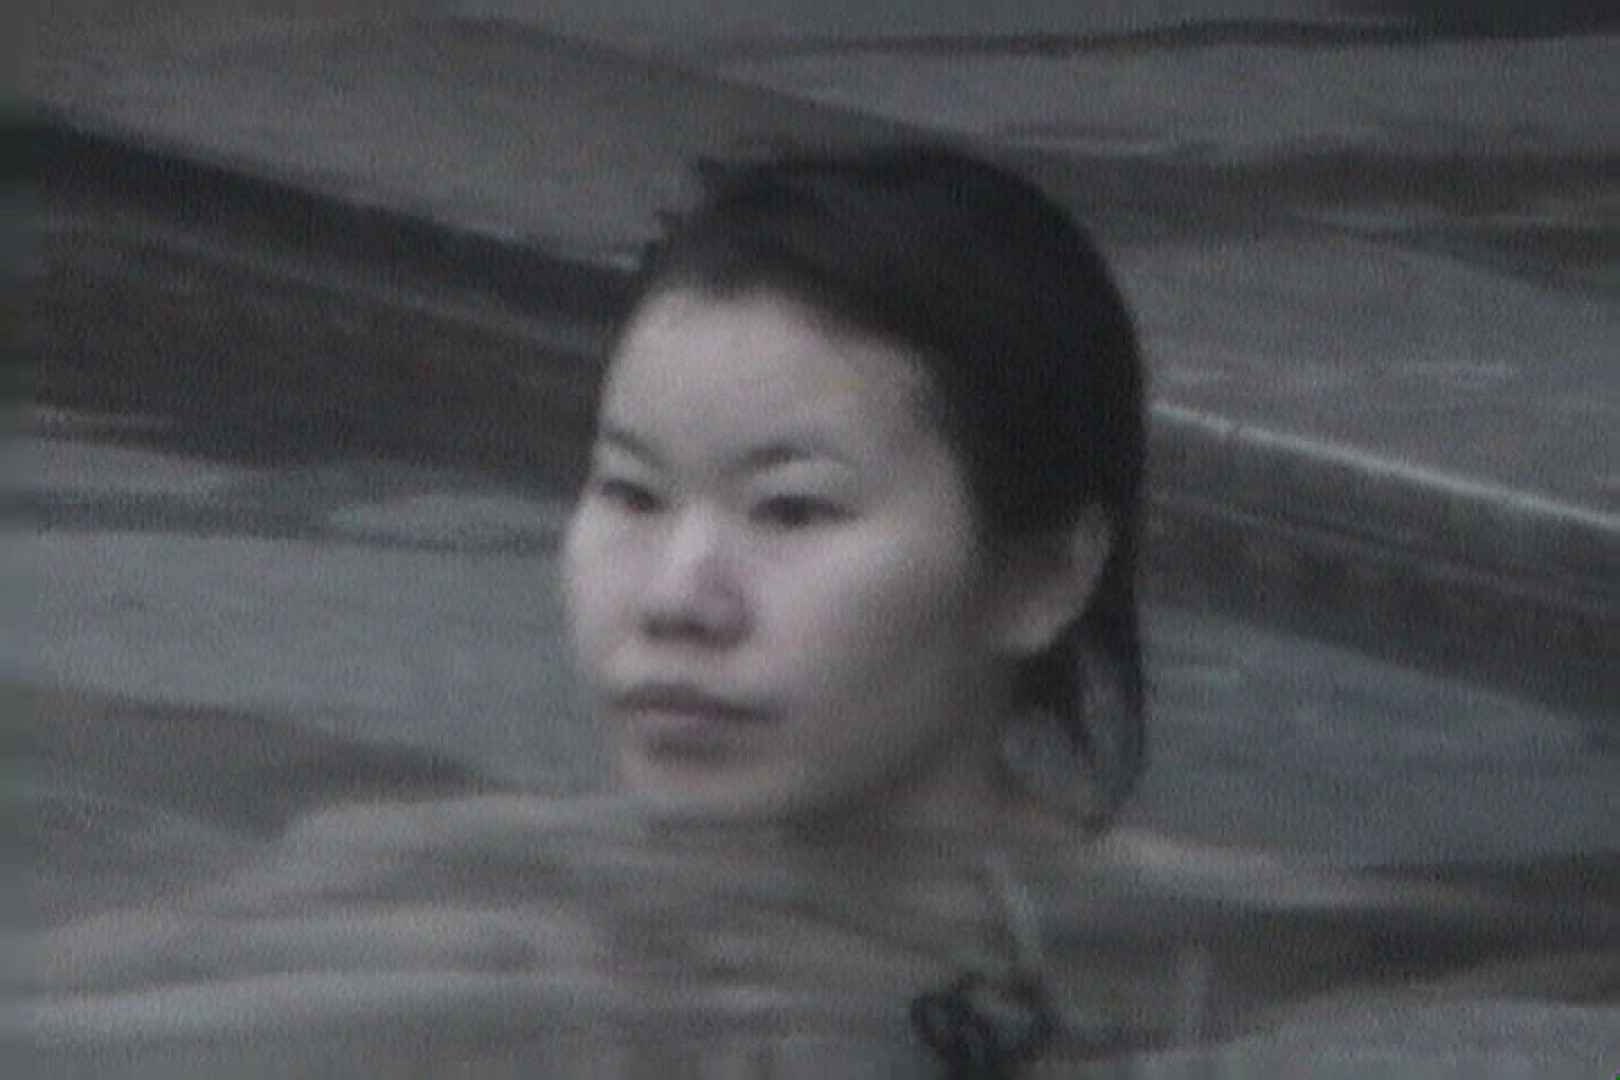 Aquaな露天風呂Vol.556 露天風呂編  99PIX 94